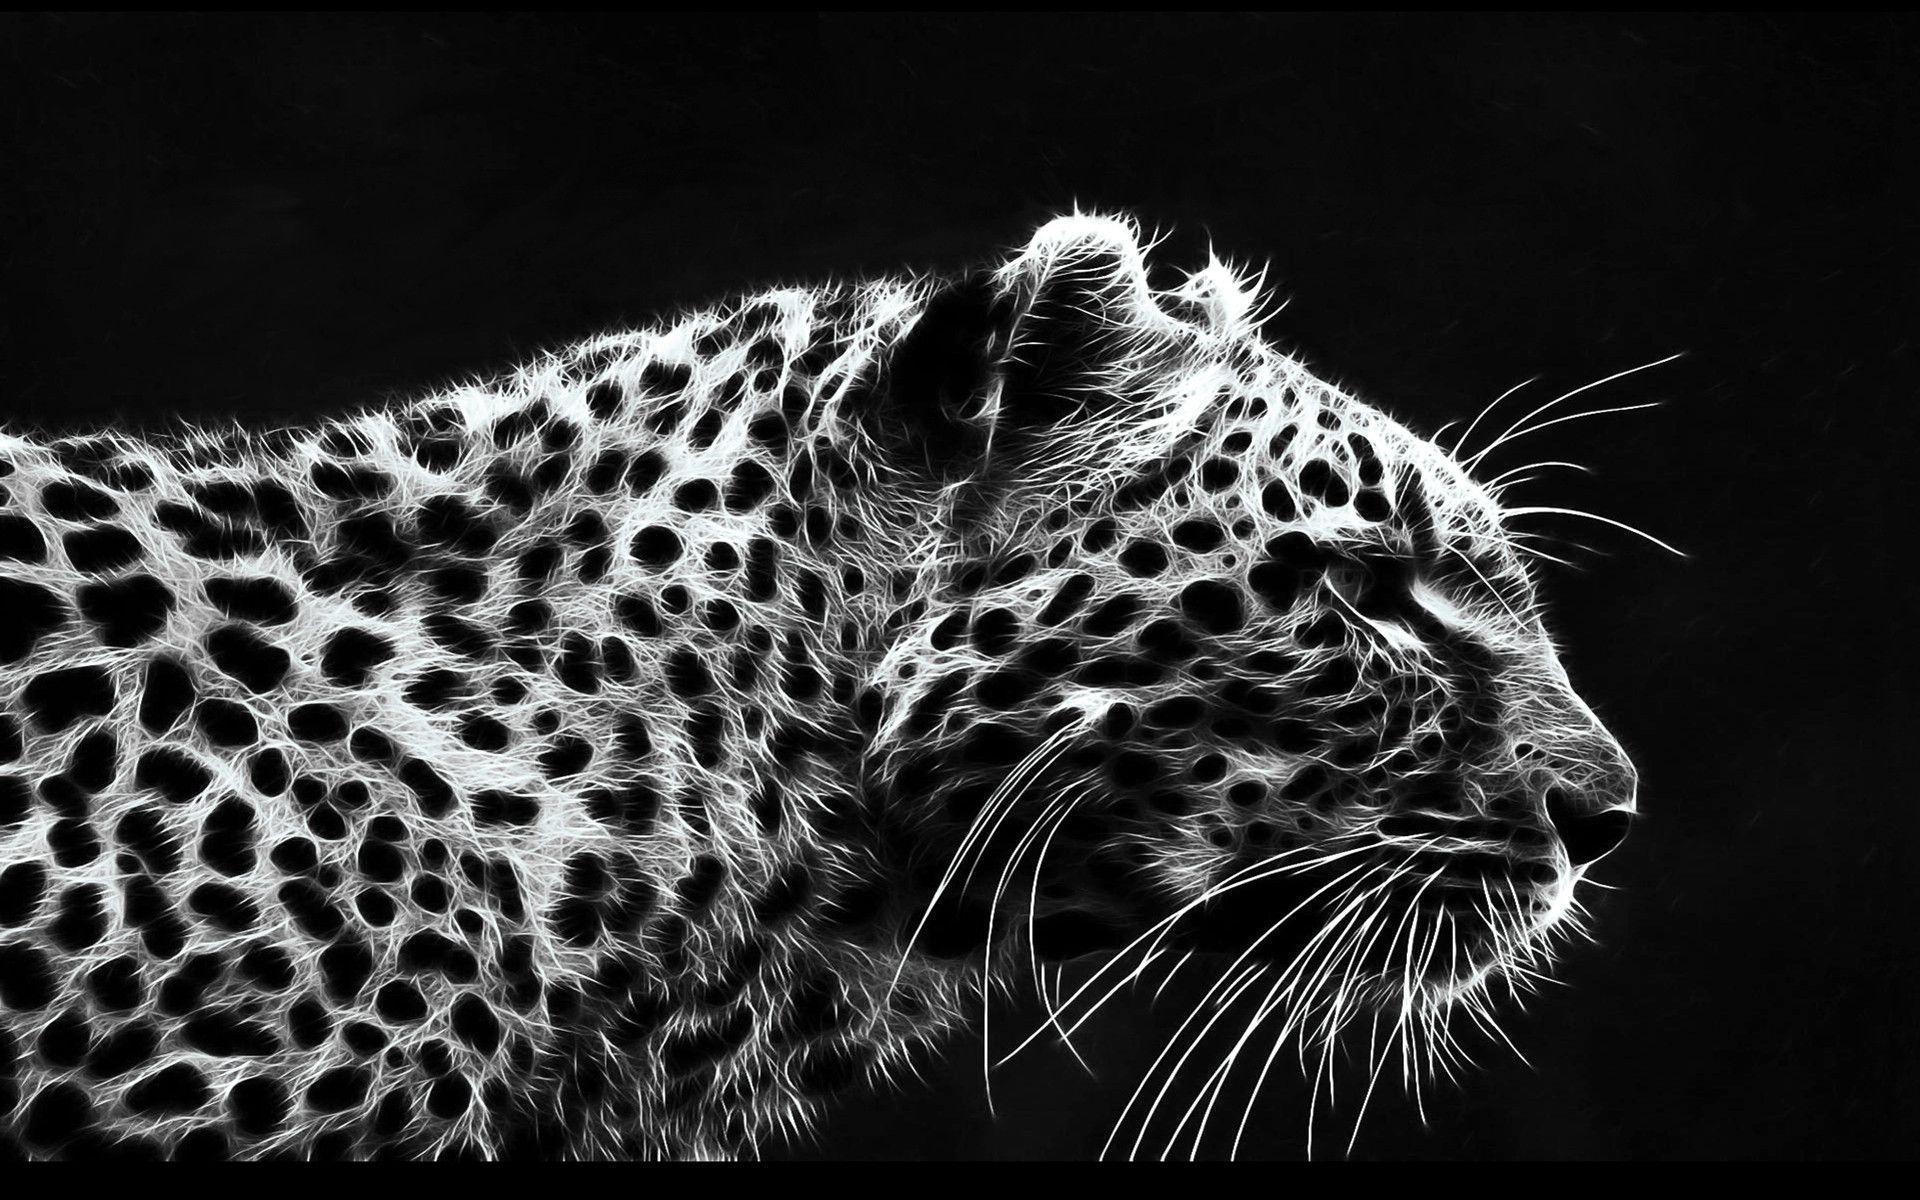 Black Leopard Wallpaper 1920x1080 1080p Resolution